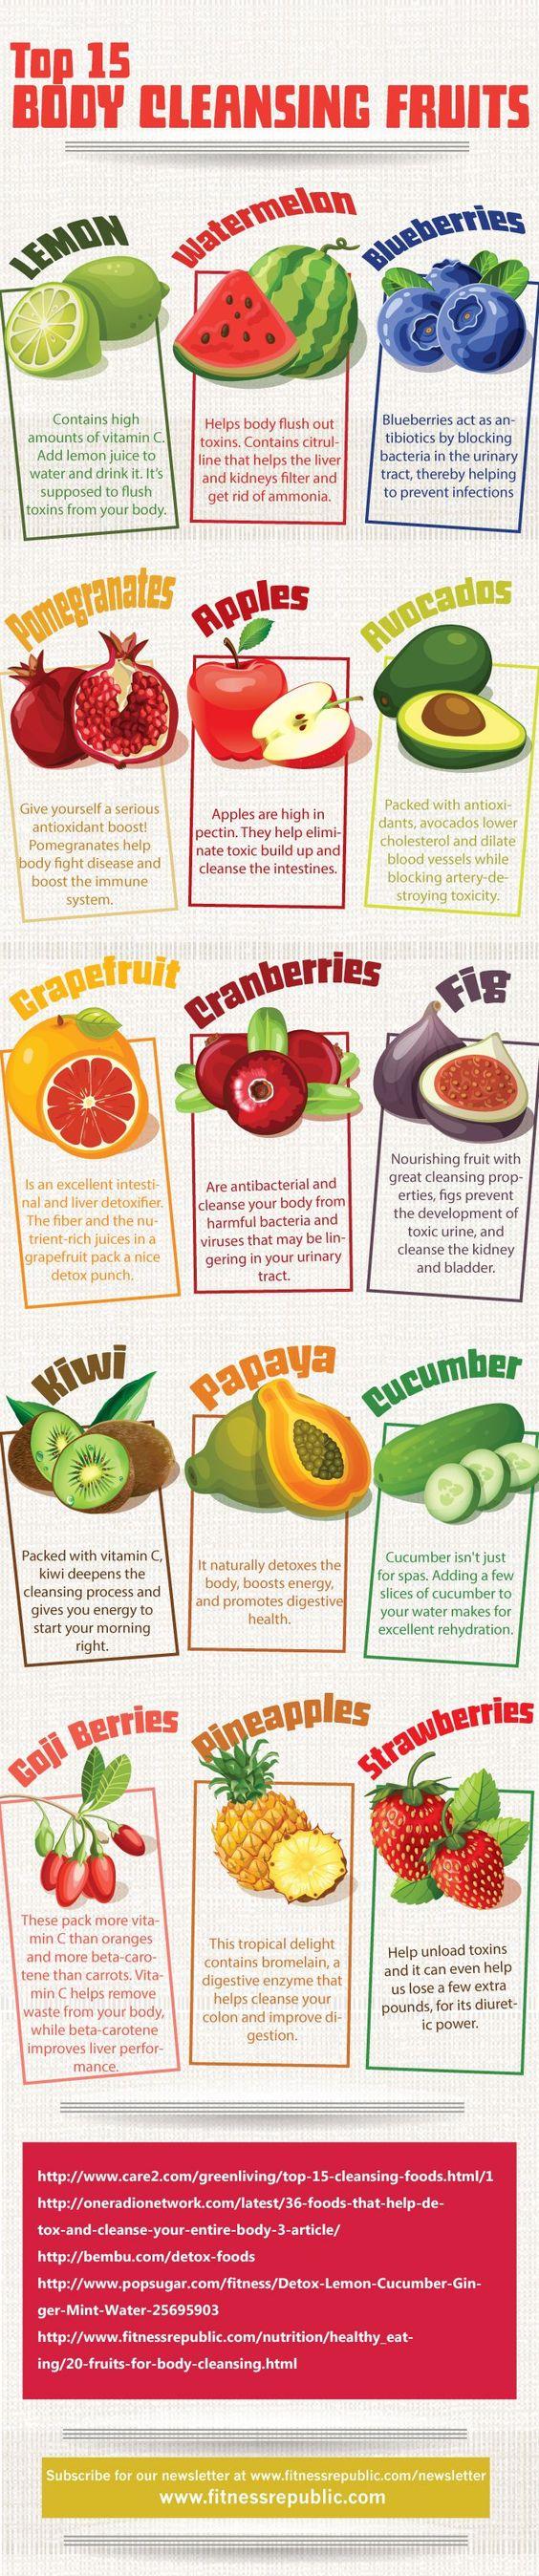 Top 15 Body Cleansing Fruits #readysetnewyou katehanke.isagenix.com: